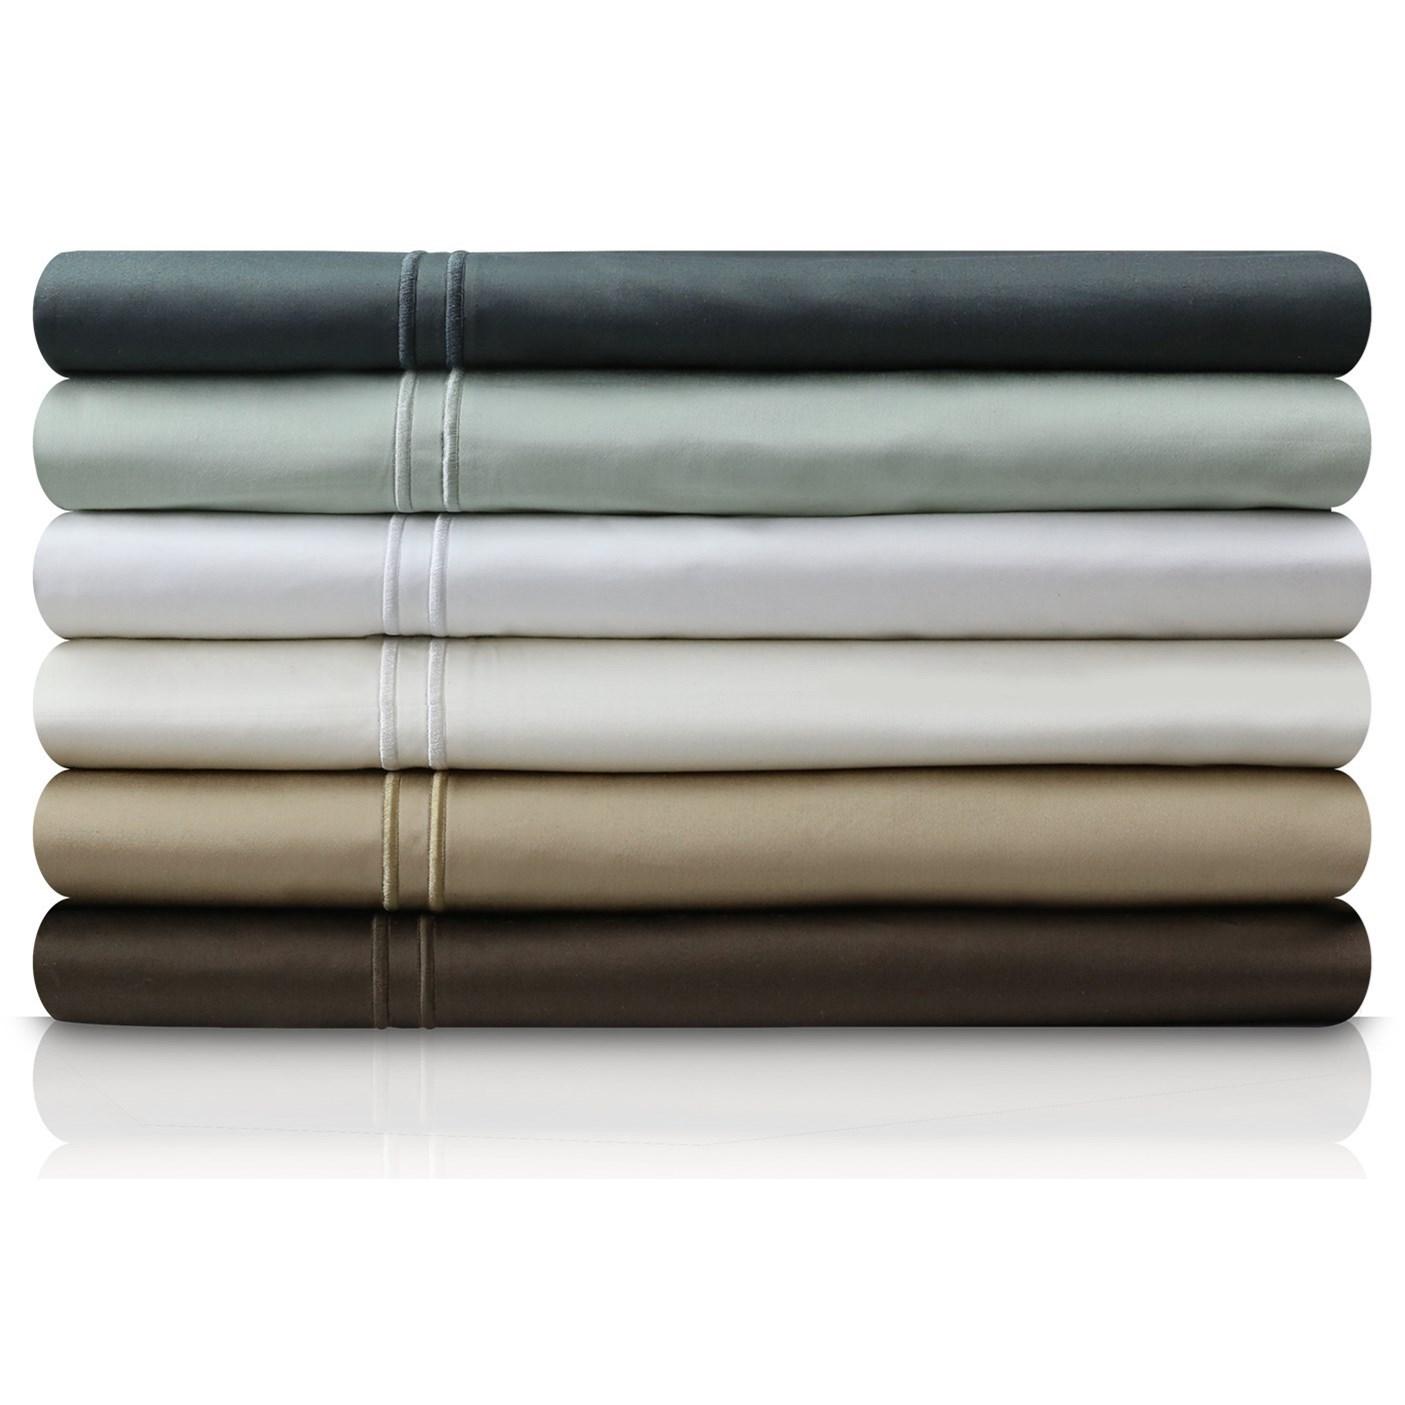 Malouf Egyptian Cotton Full XL 400 TC Egyptian Cotton Sheet Set - Item Number: MA04FXKHSS